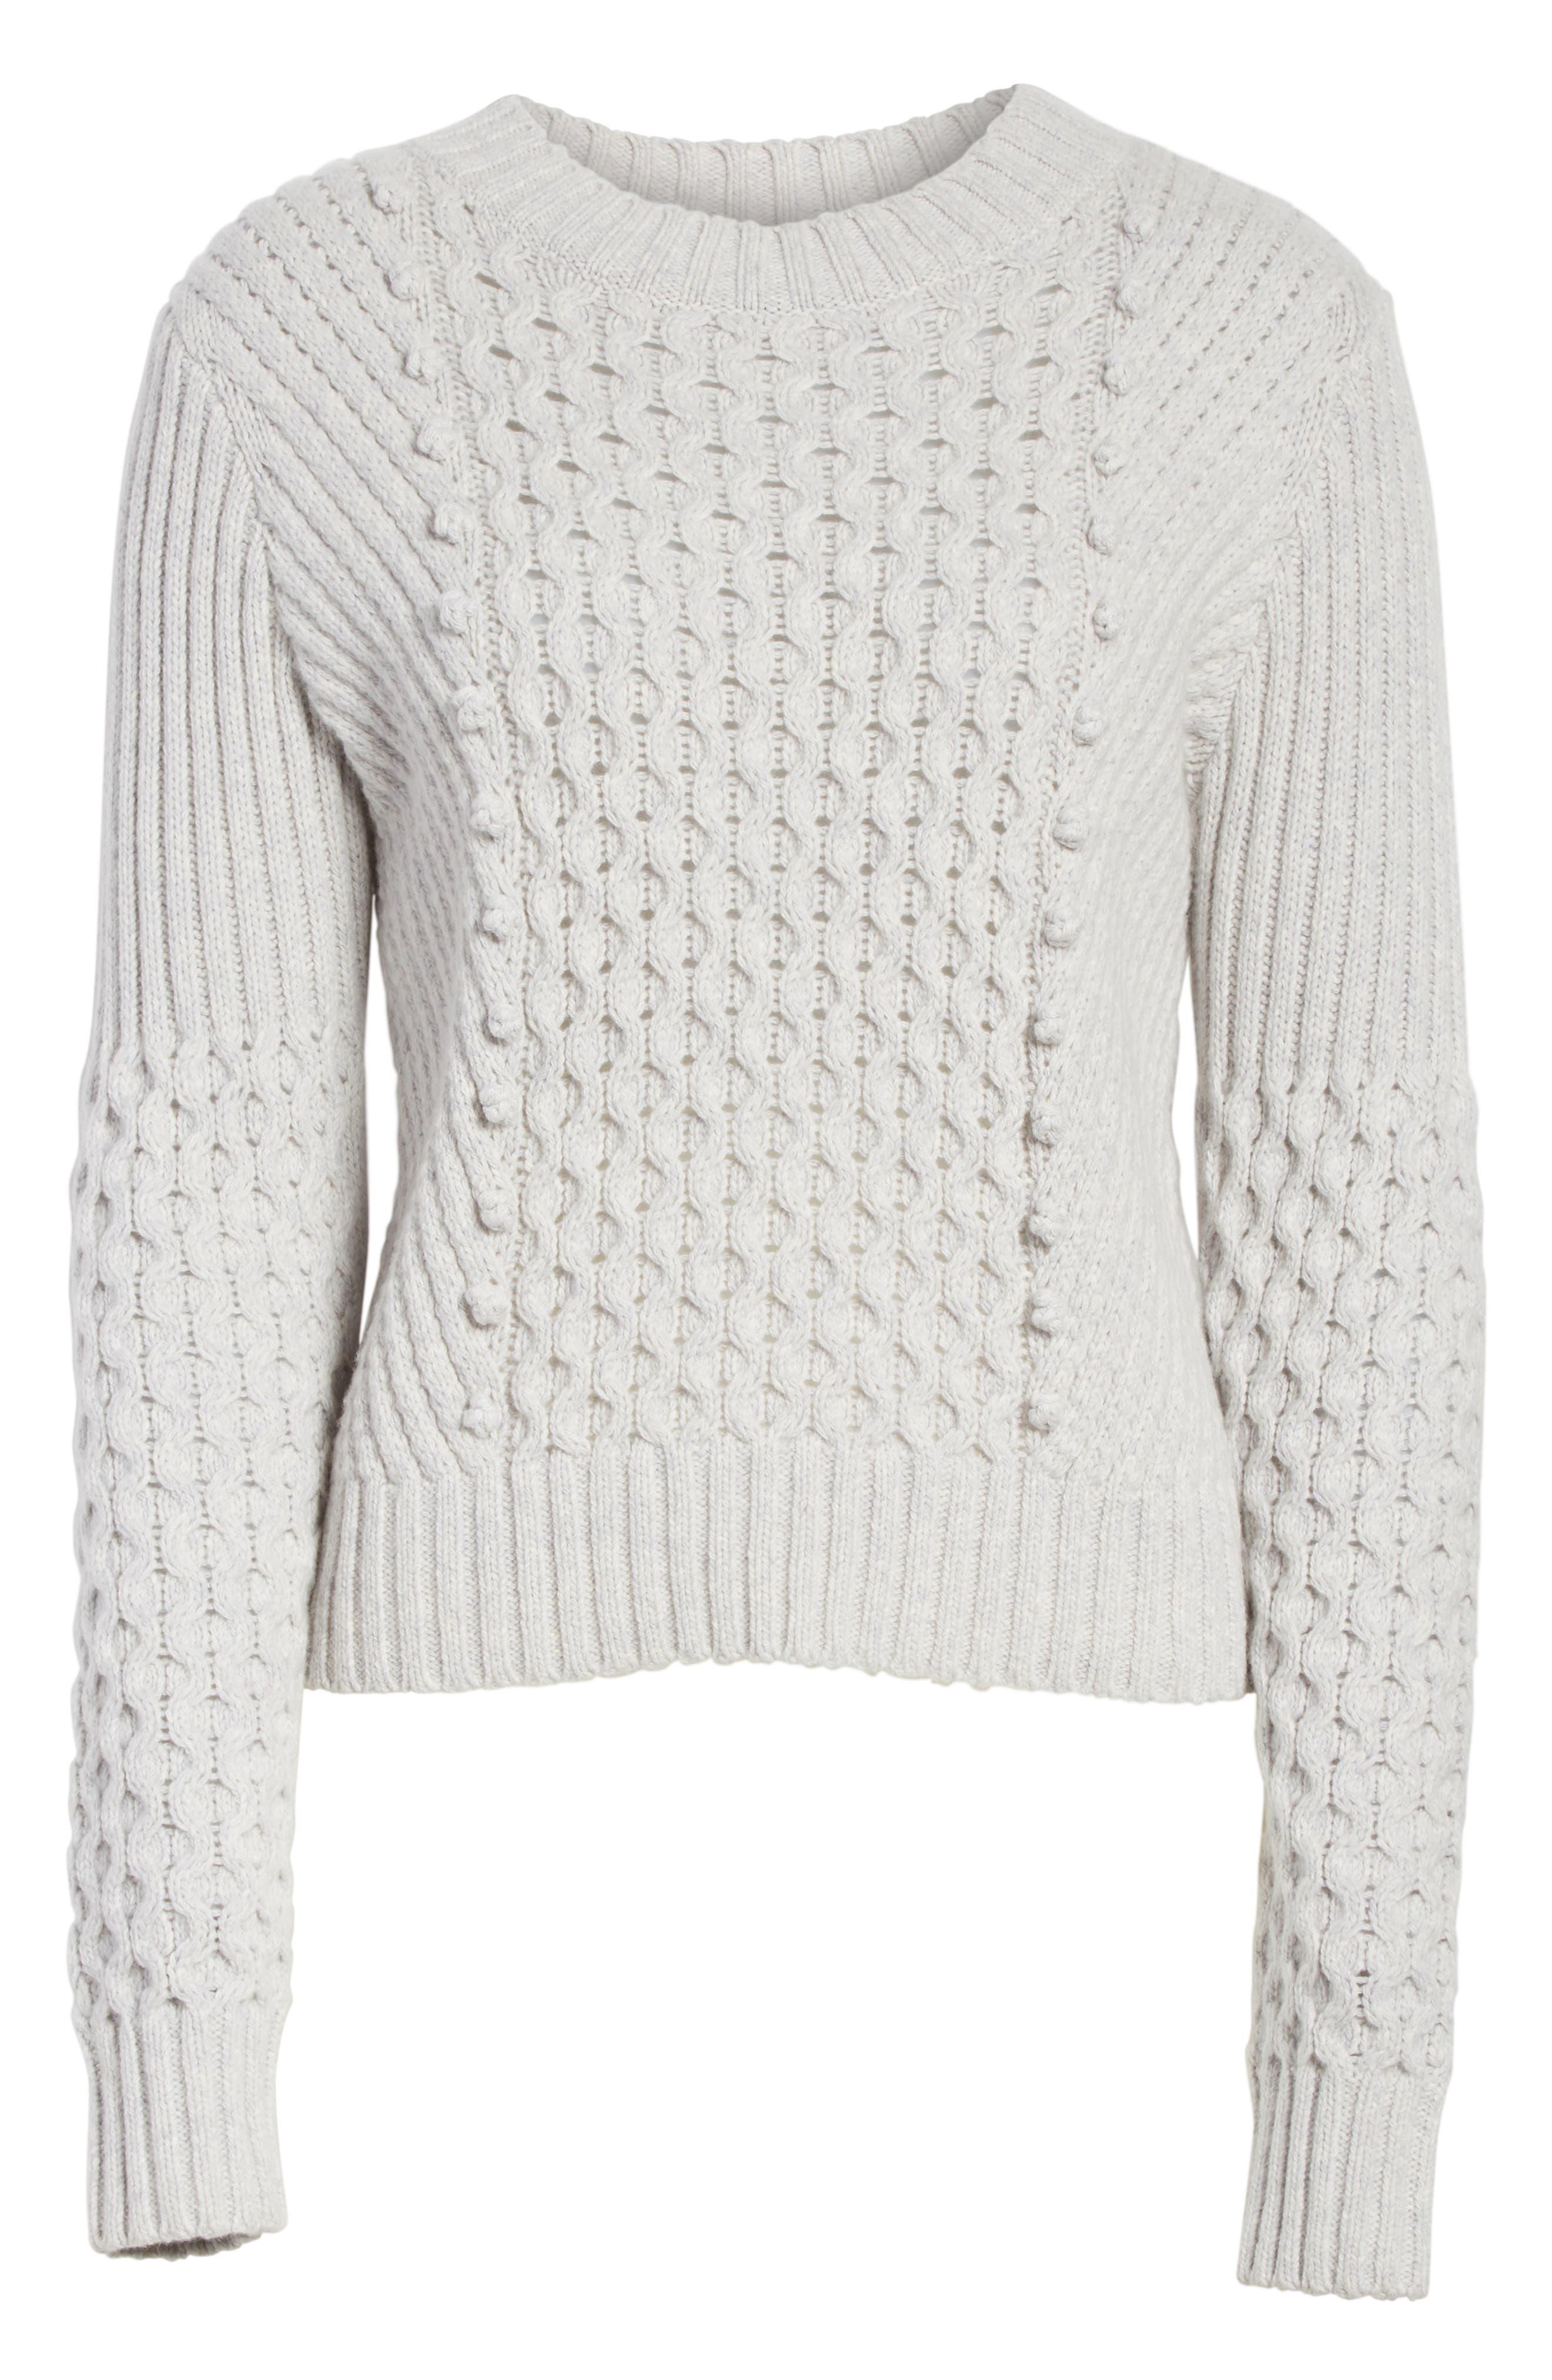 Honeycomb Stitch Sweater,                             Alternate thumbnail 6, color,                             Light Grey Heather